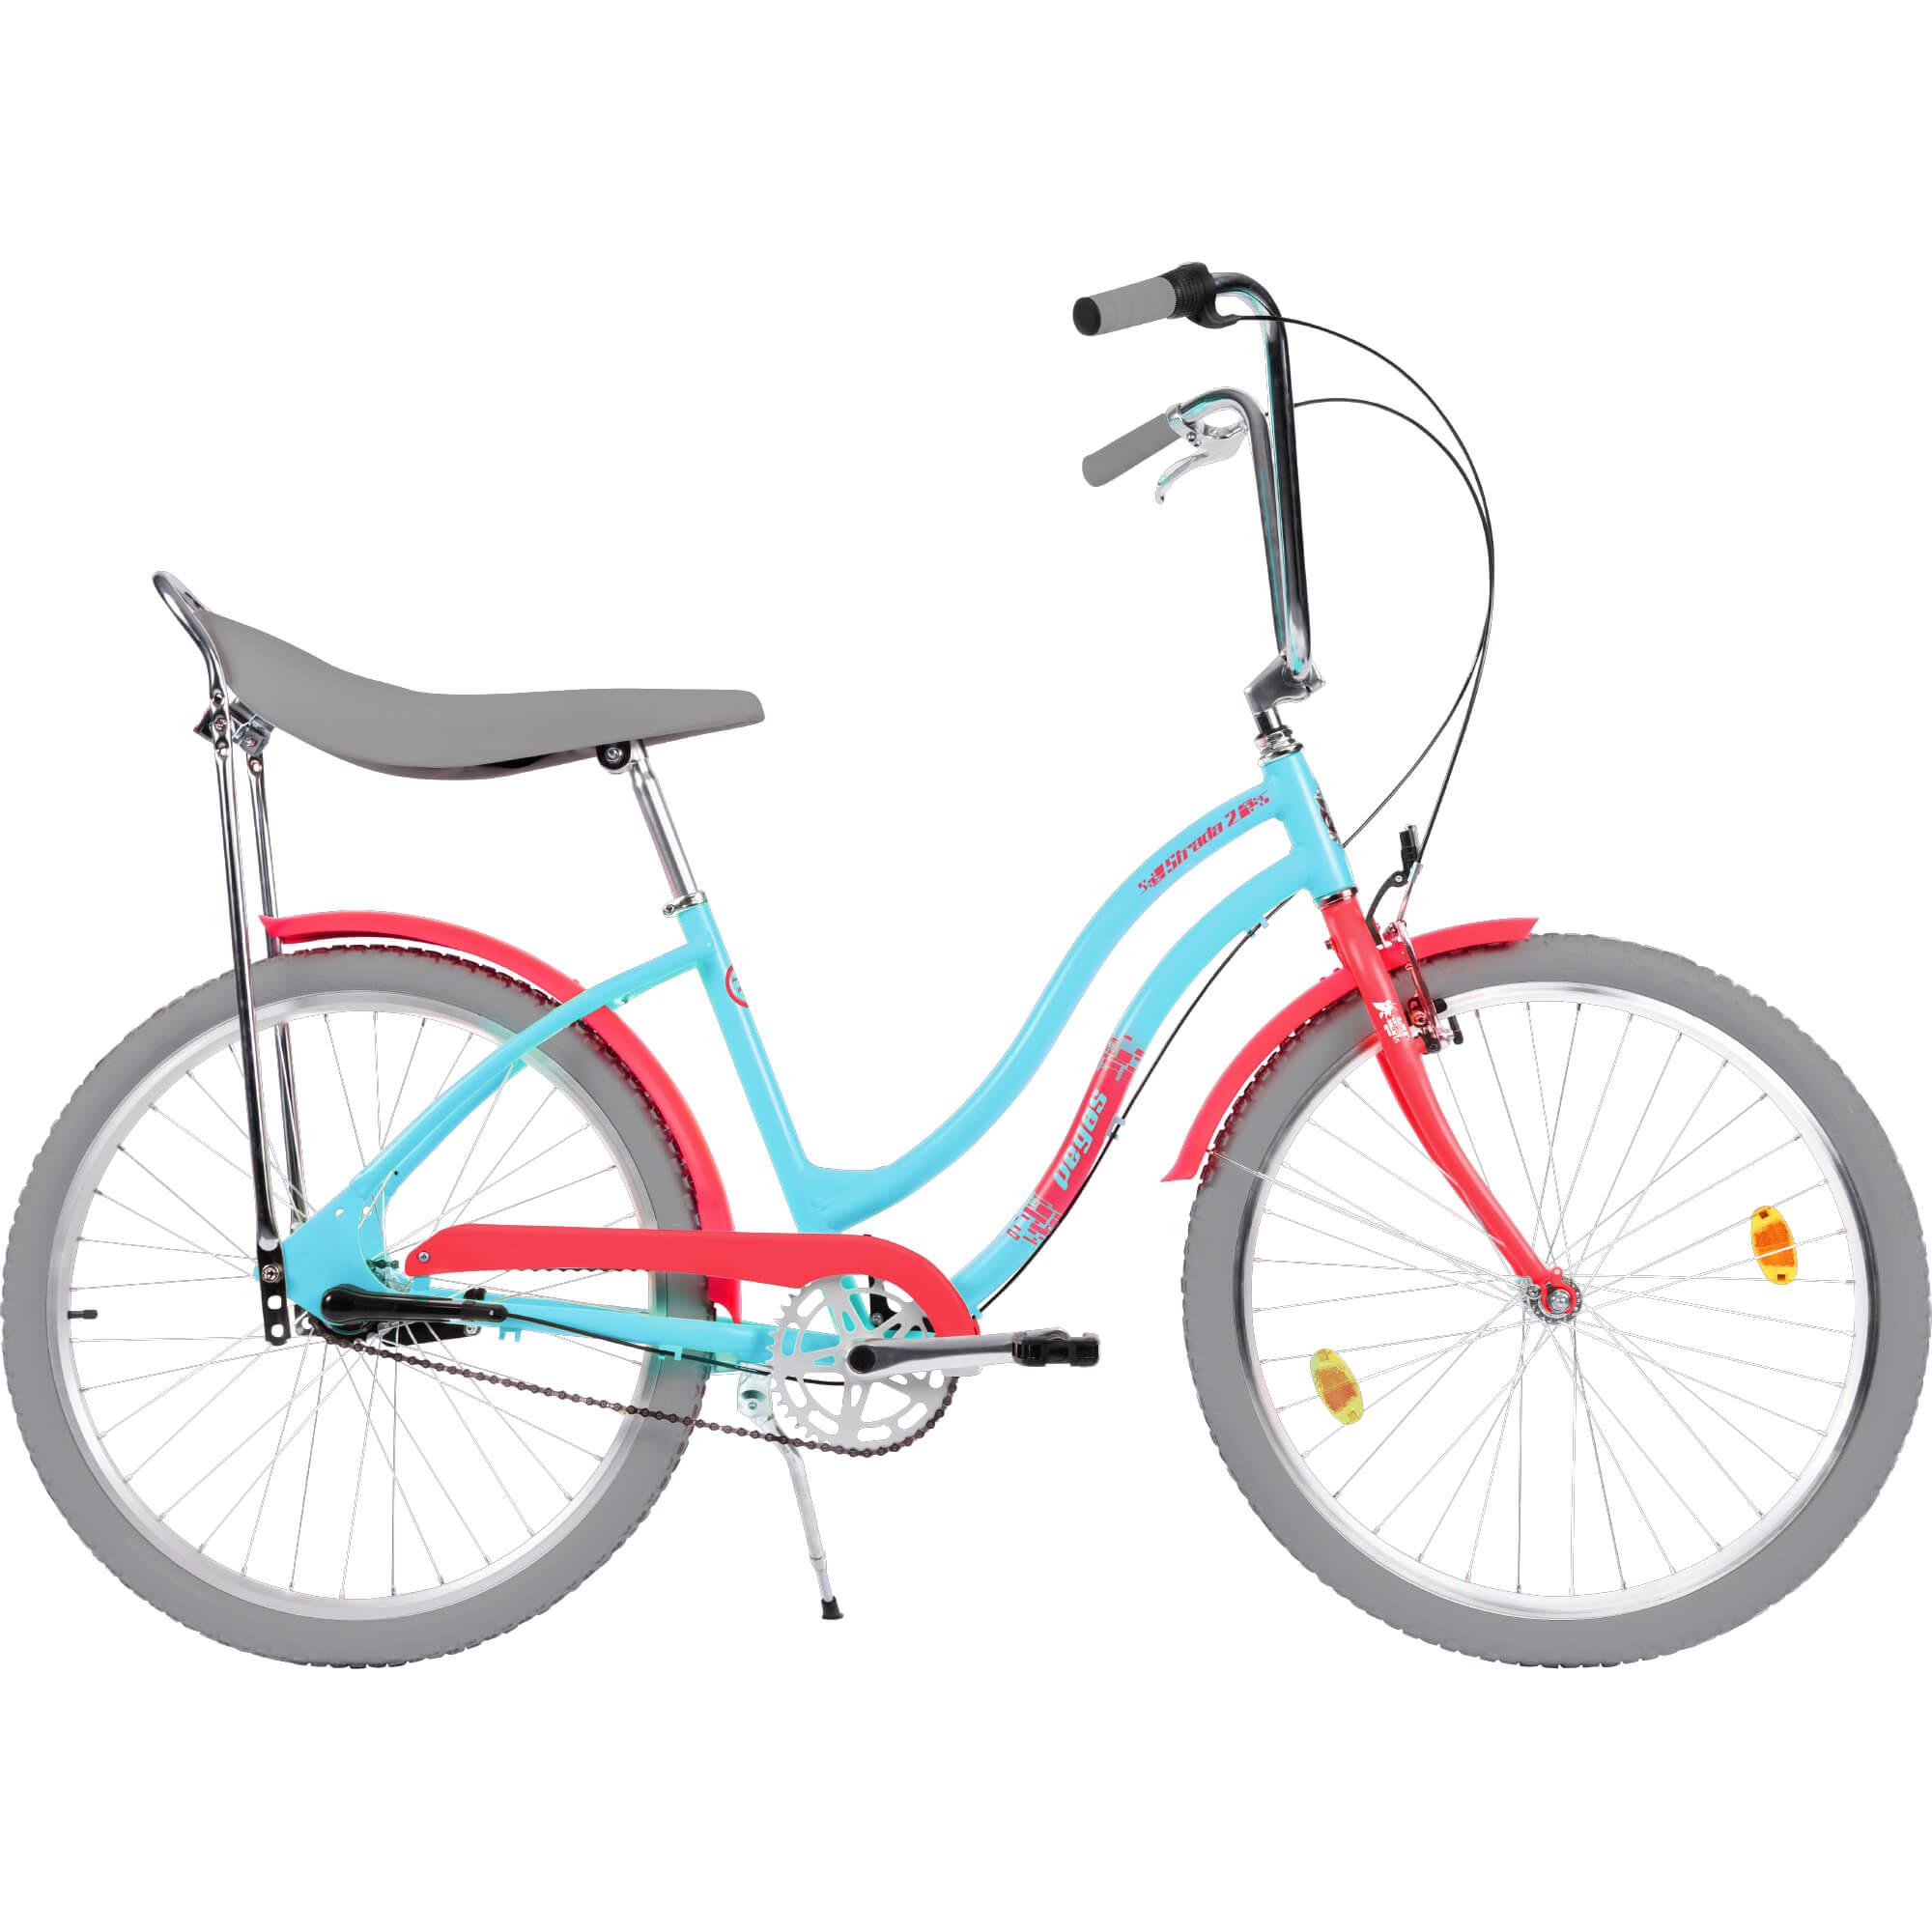 Citybike STRADA 2 OTEL imagine